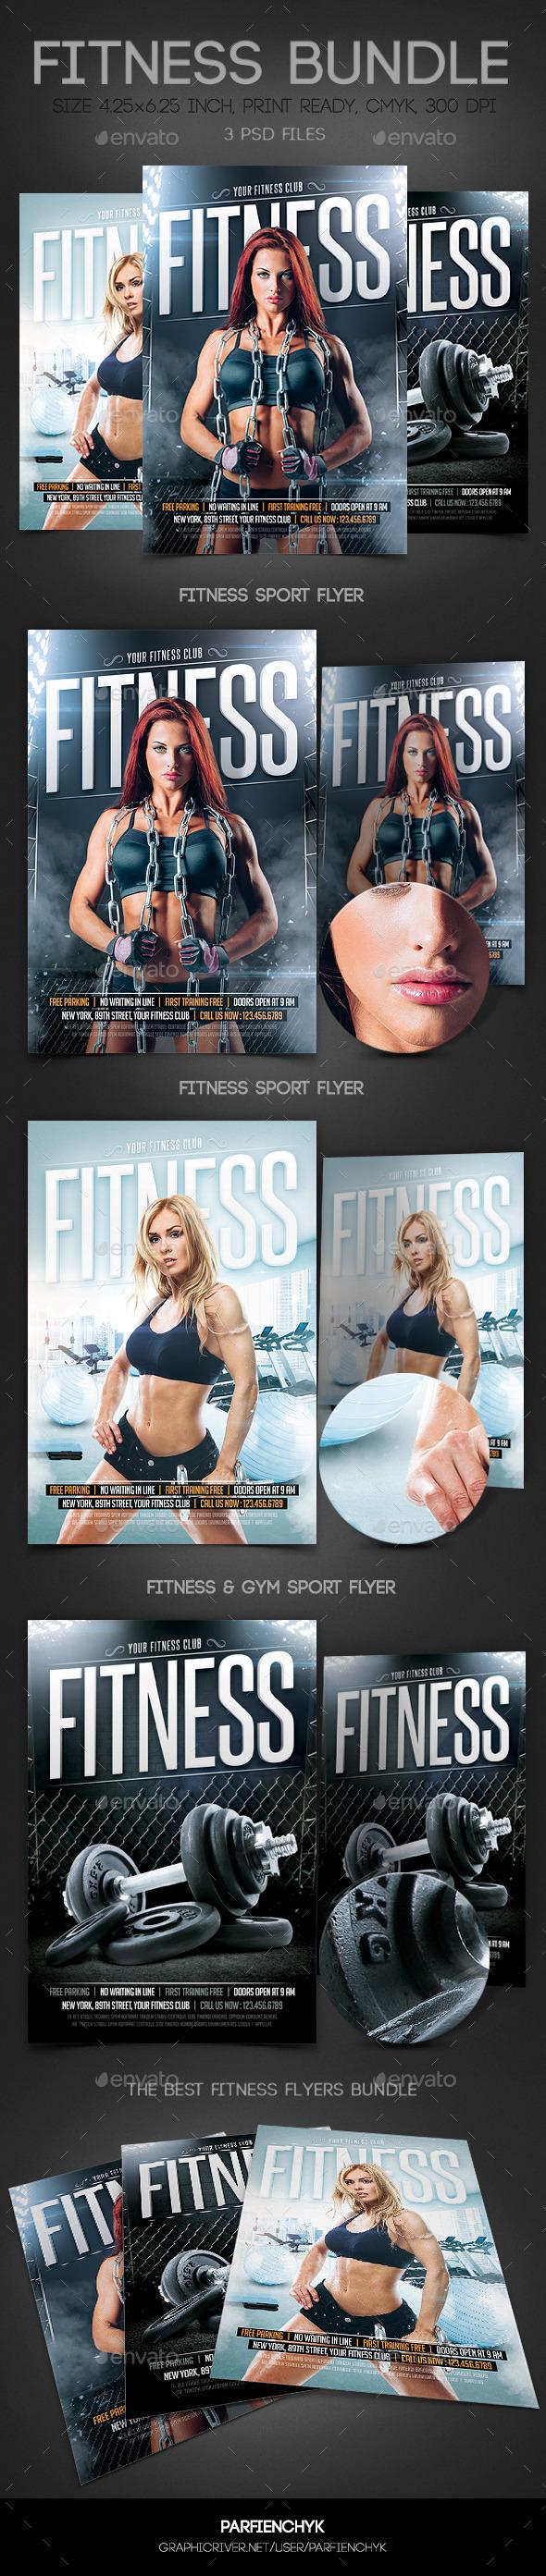 Fitness & Gym Sport Flyers Bundle